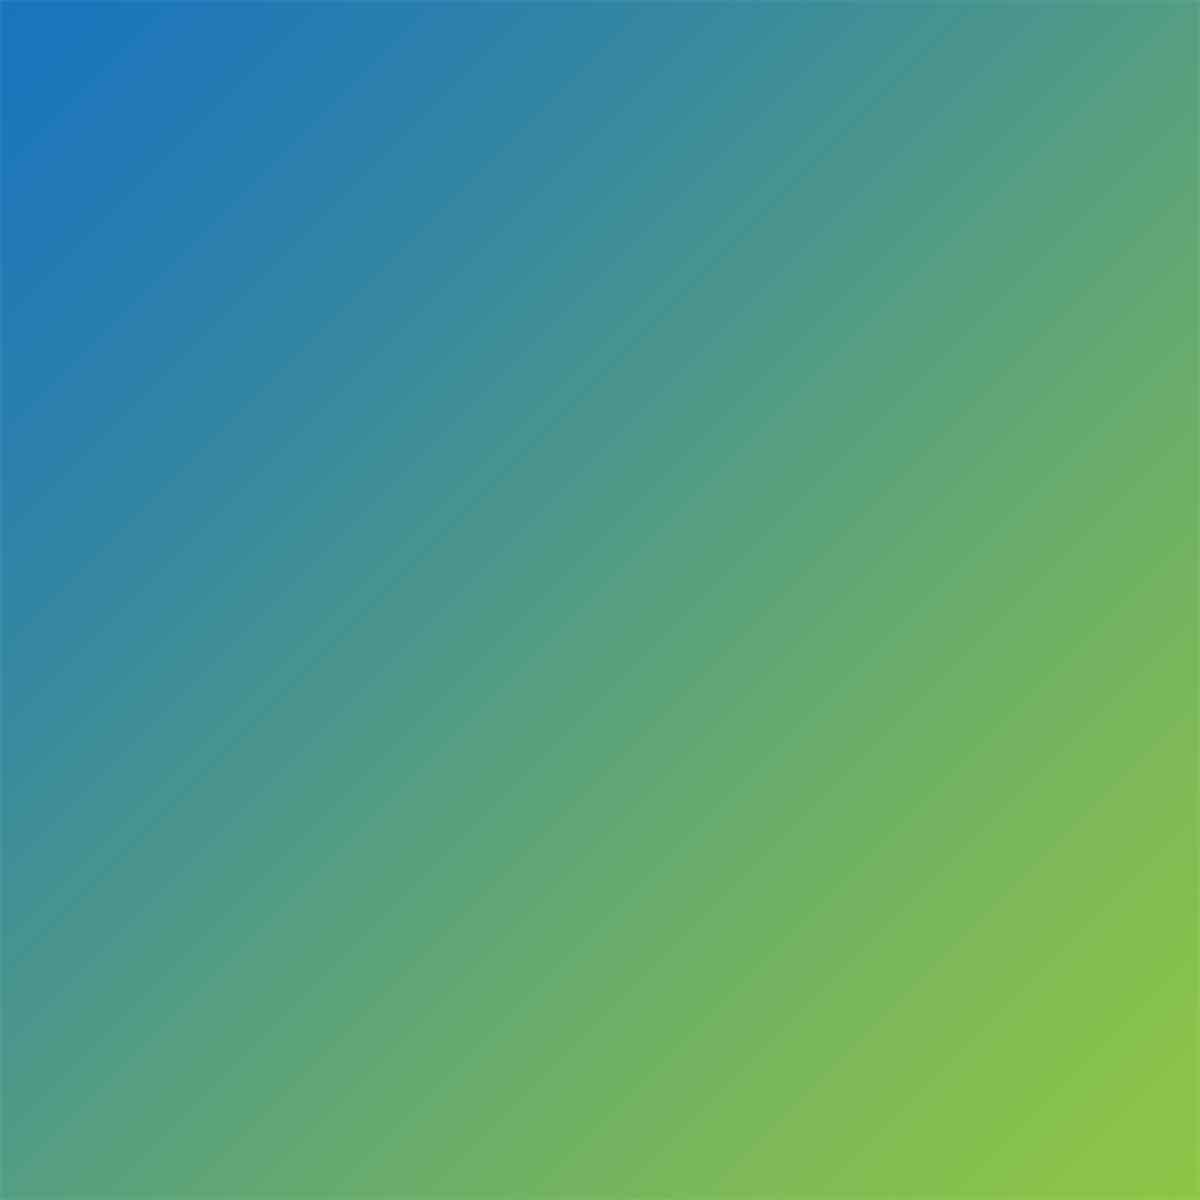 https://www.atlantivacations.com/wp-content/uploads/2018/09/bgn-image-box-gradient.jpg